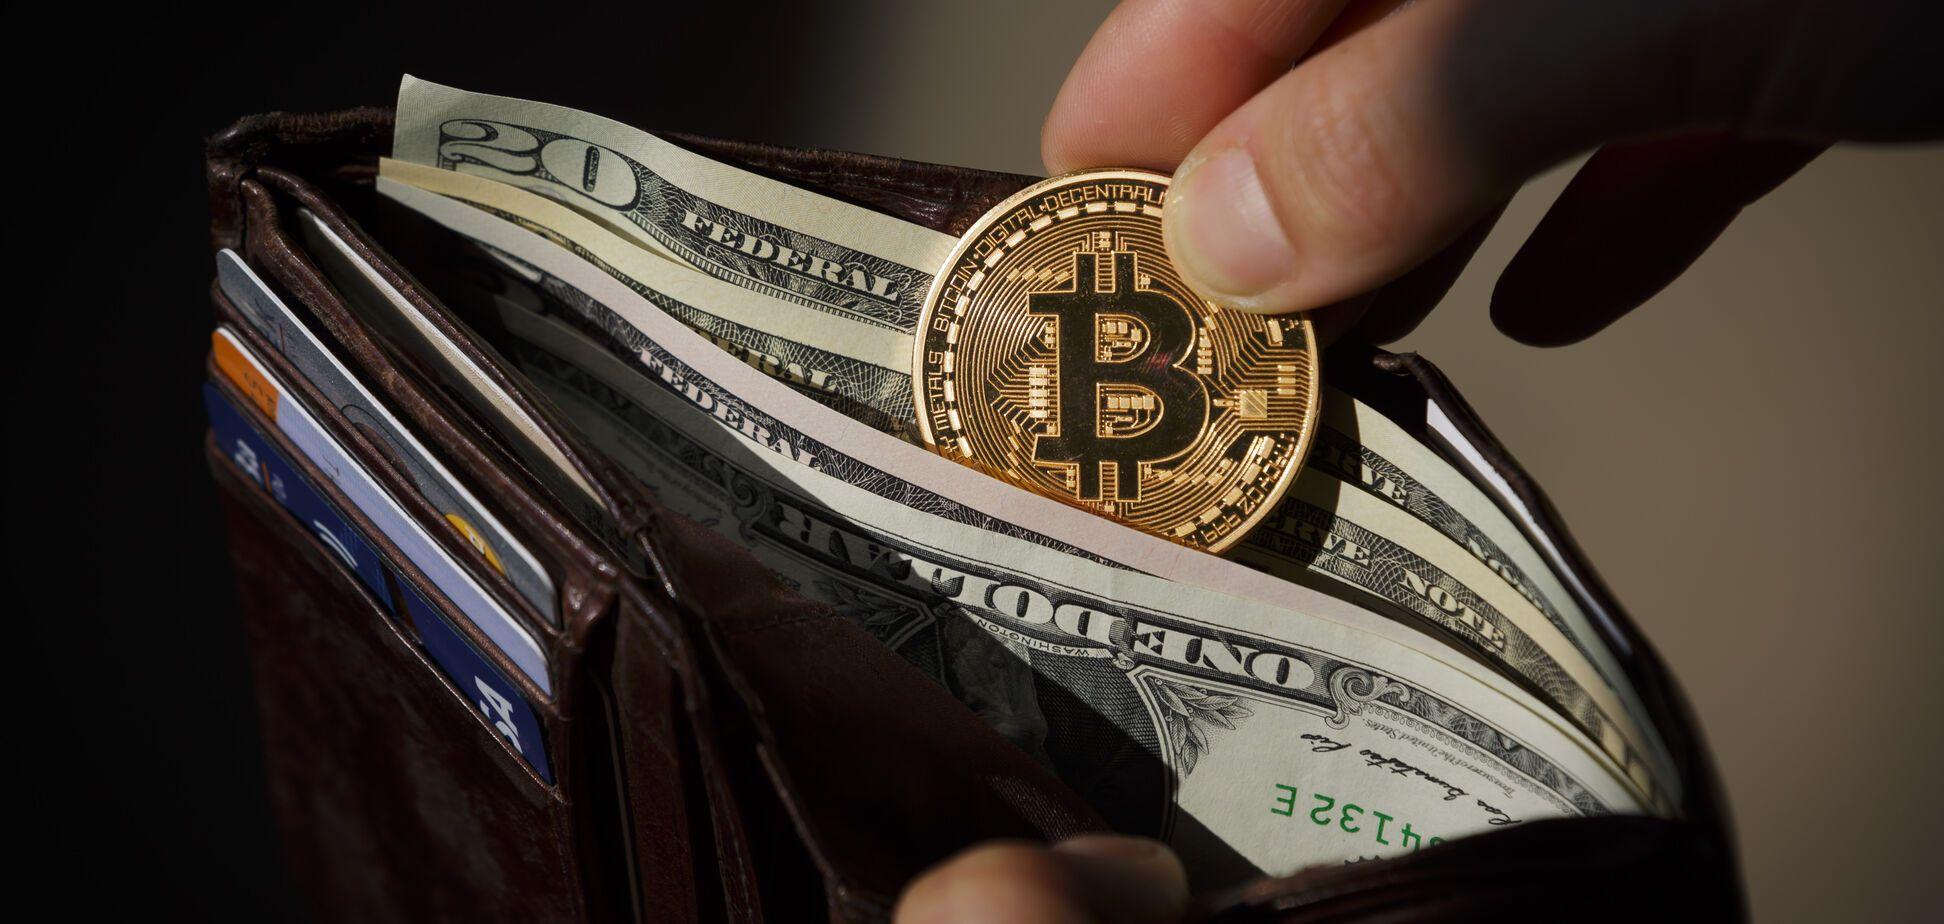 Новый рекорд: биткоин подорожал до $15 тысяч